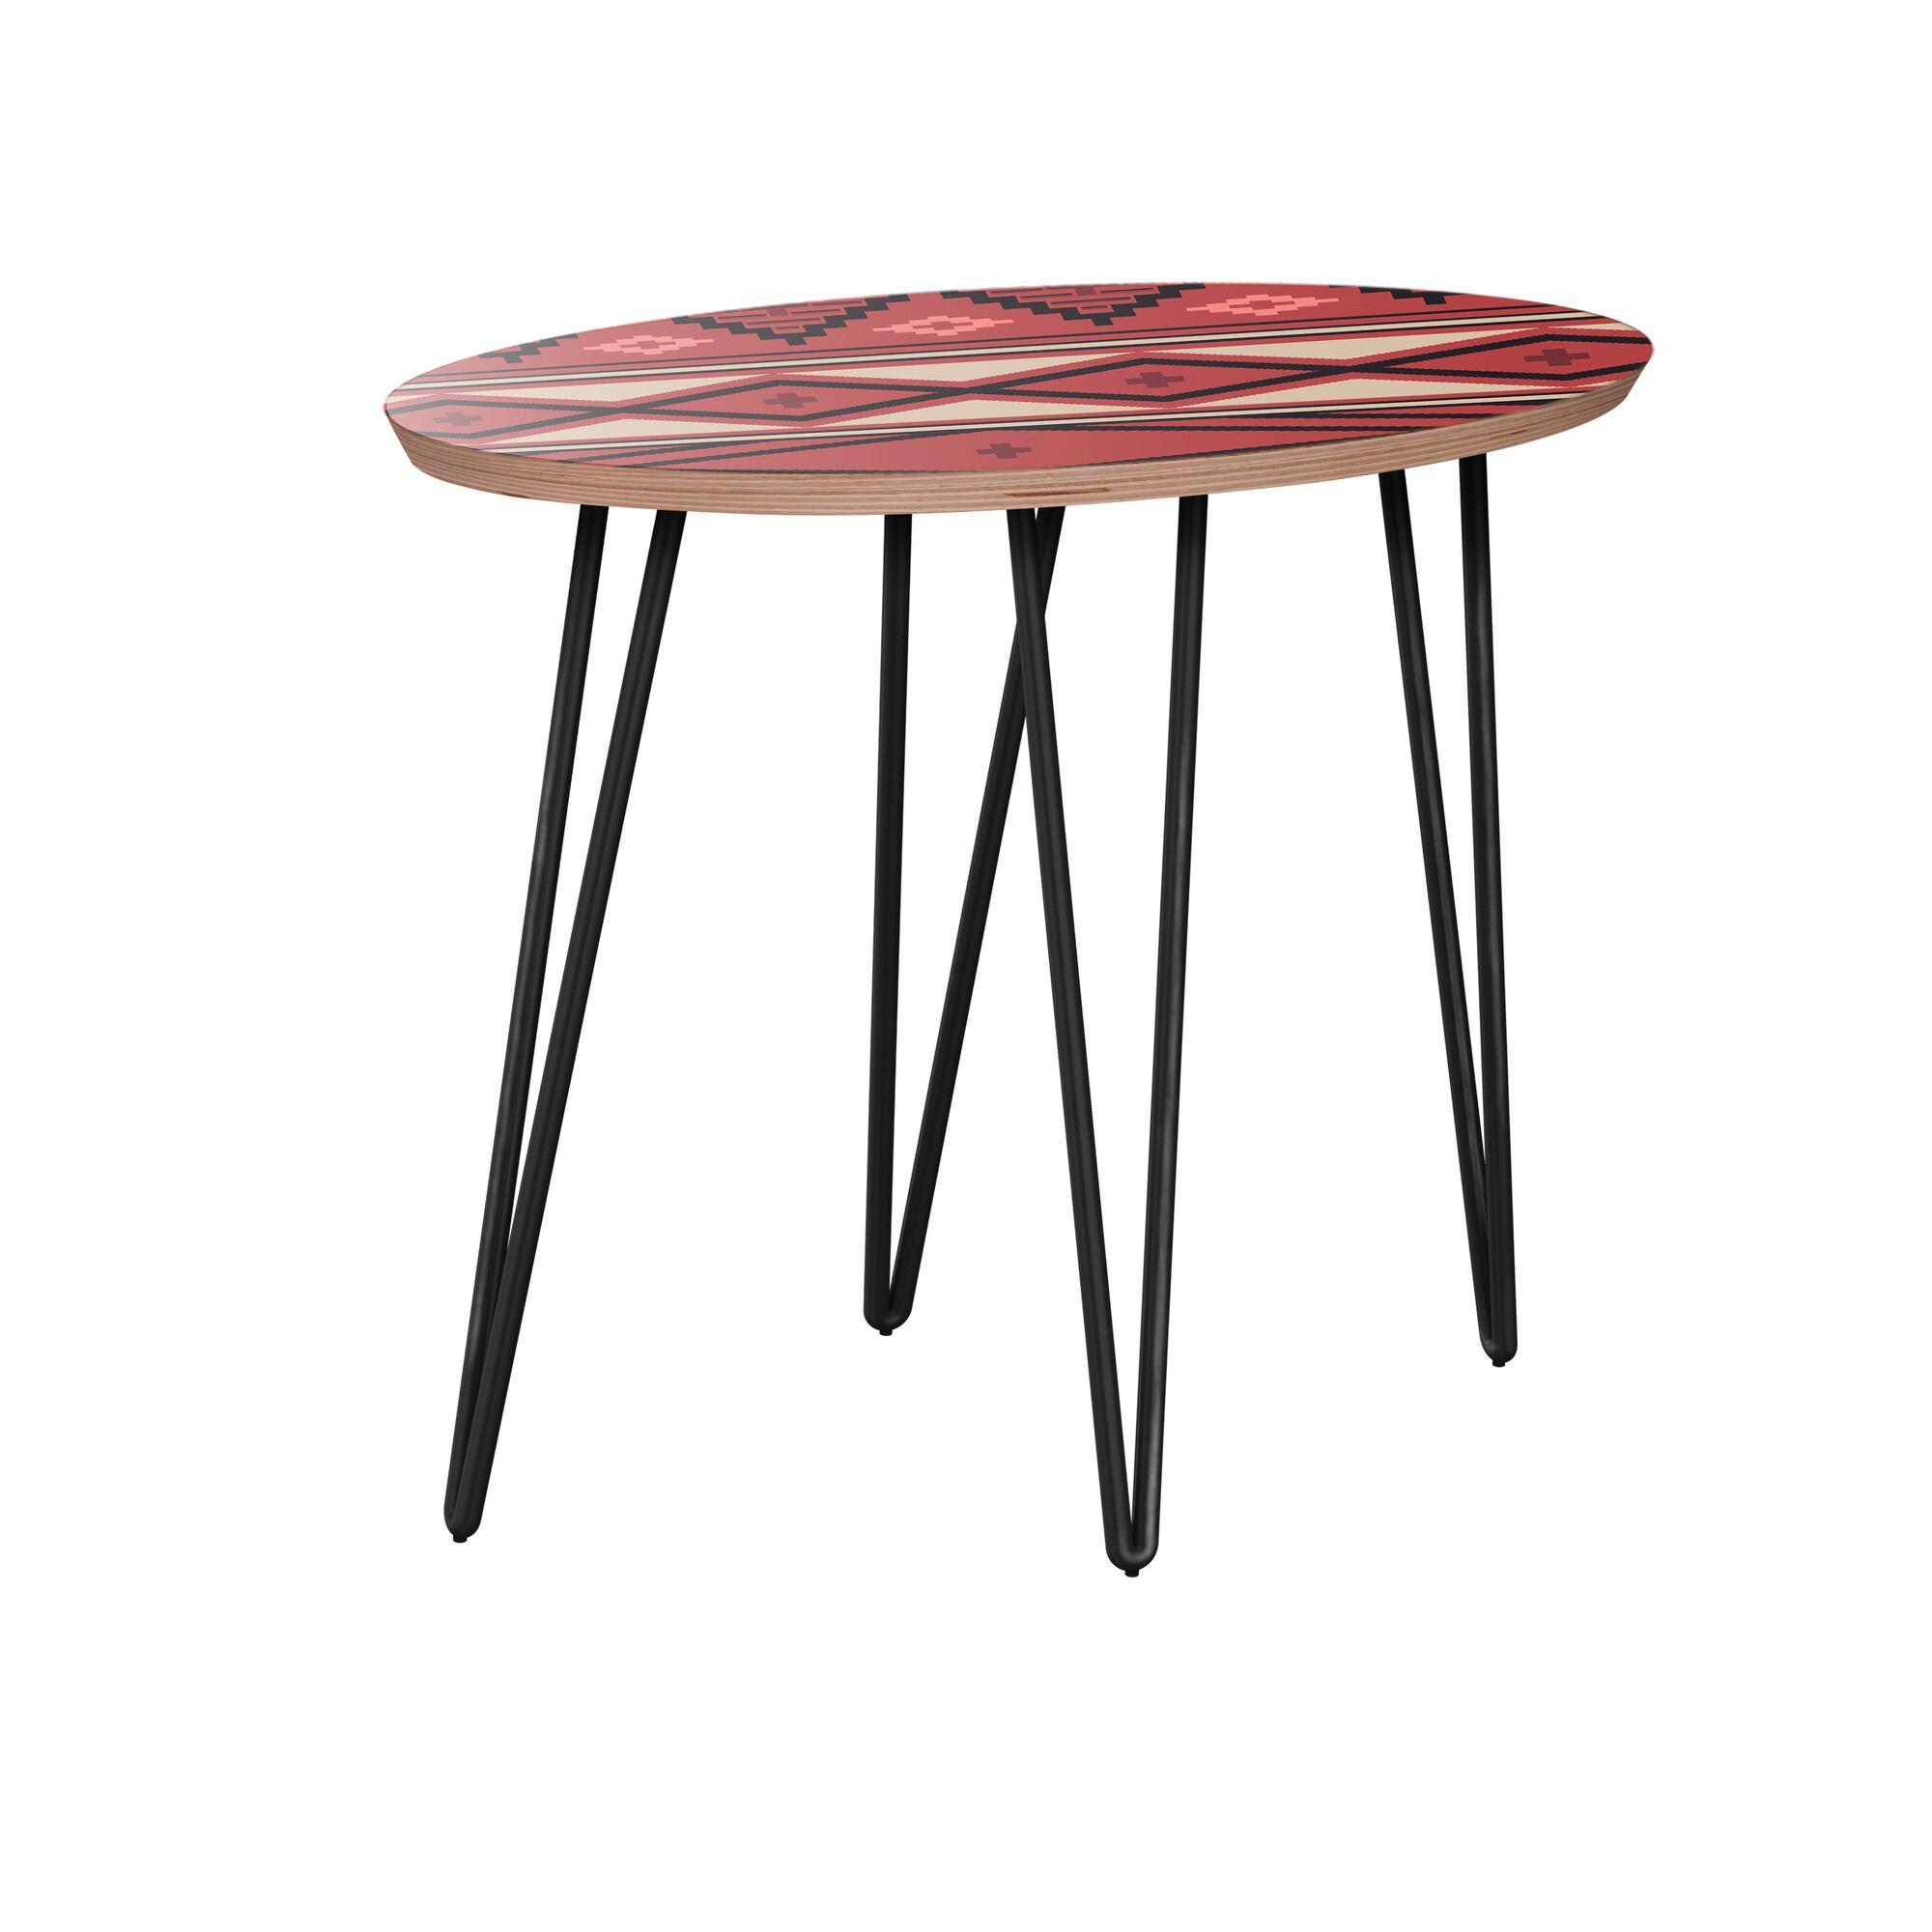 Holderman End Table Table Base Color: Black, Table Top Boarder Color: Walnut, Table Top Color: Red